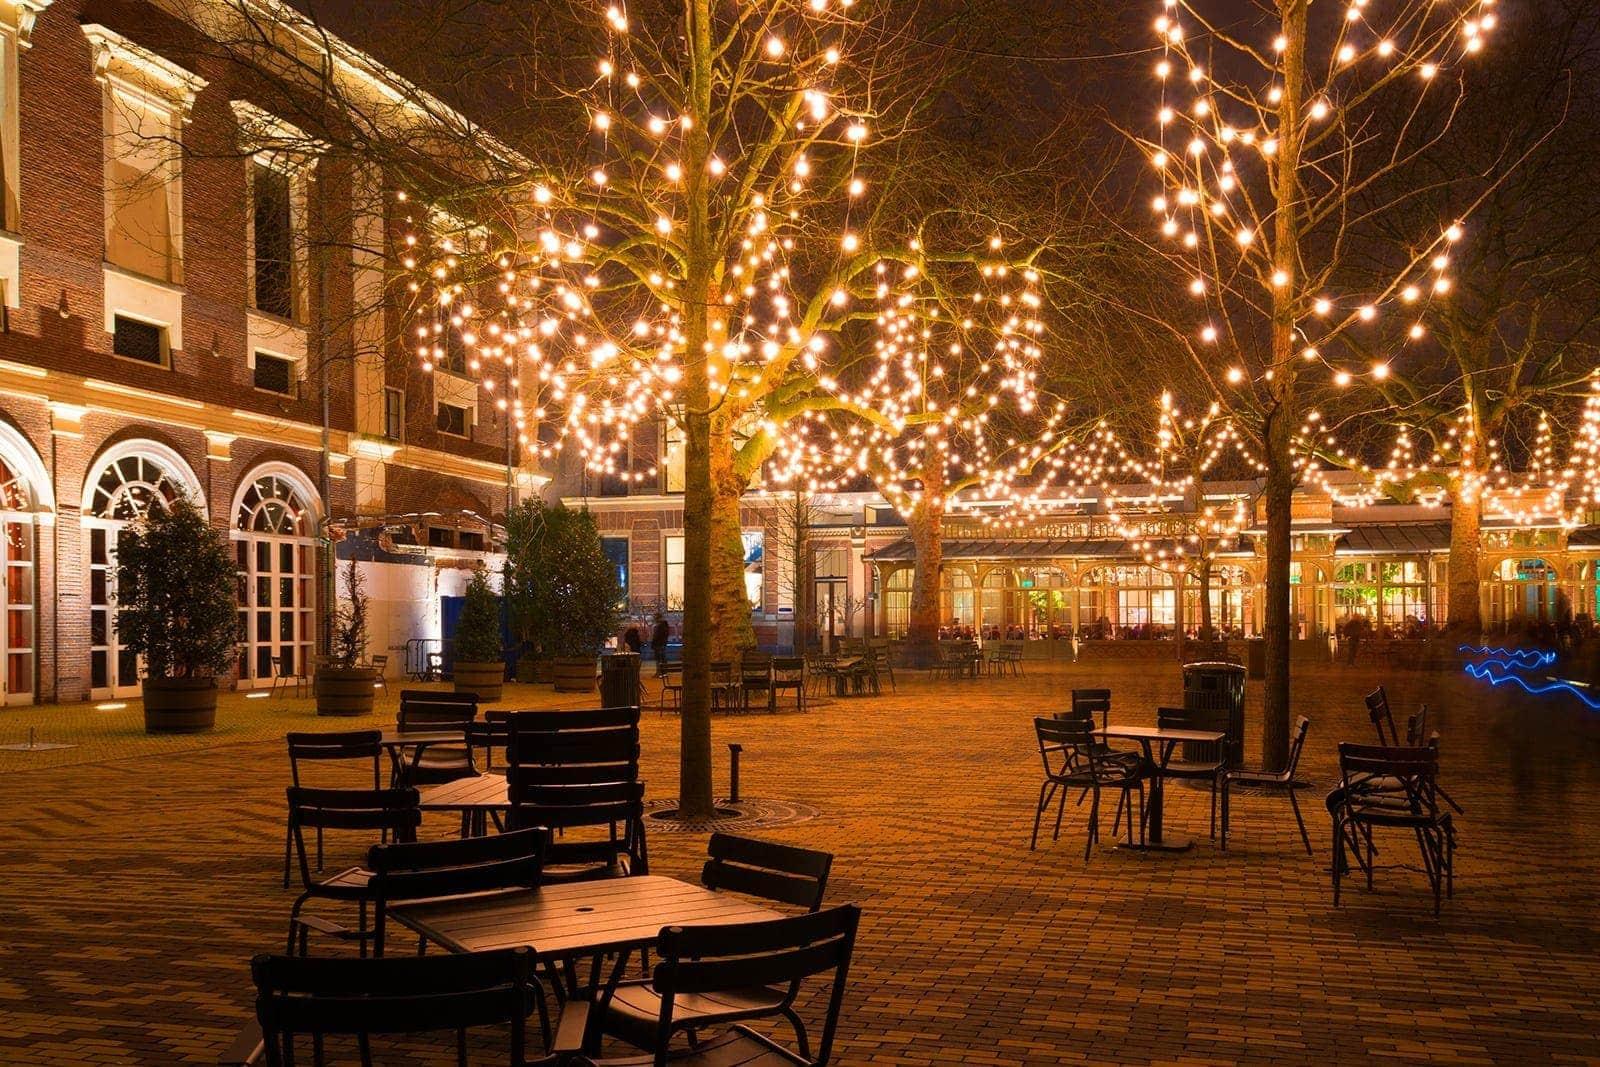 Prikkabel LED 10 meter • 20 lampen • Warm wit helder » Starterset